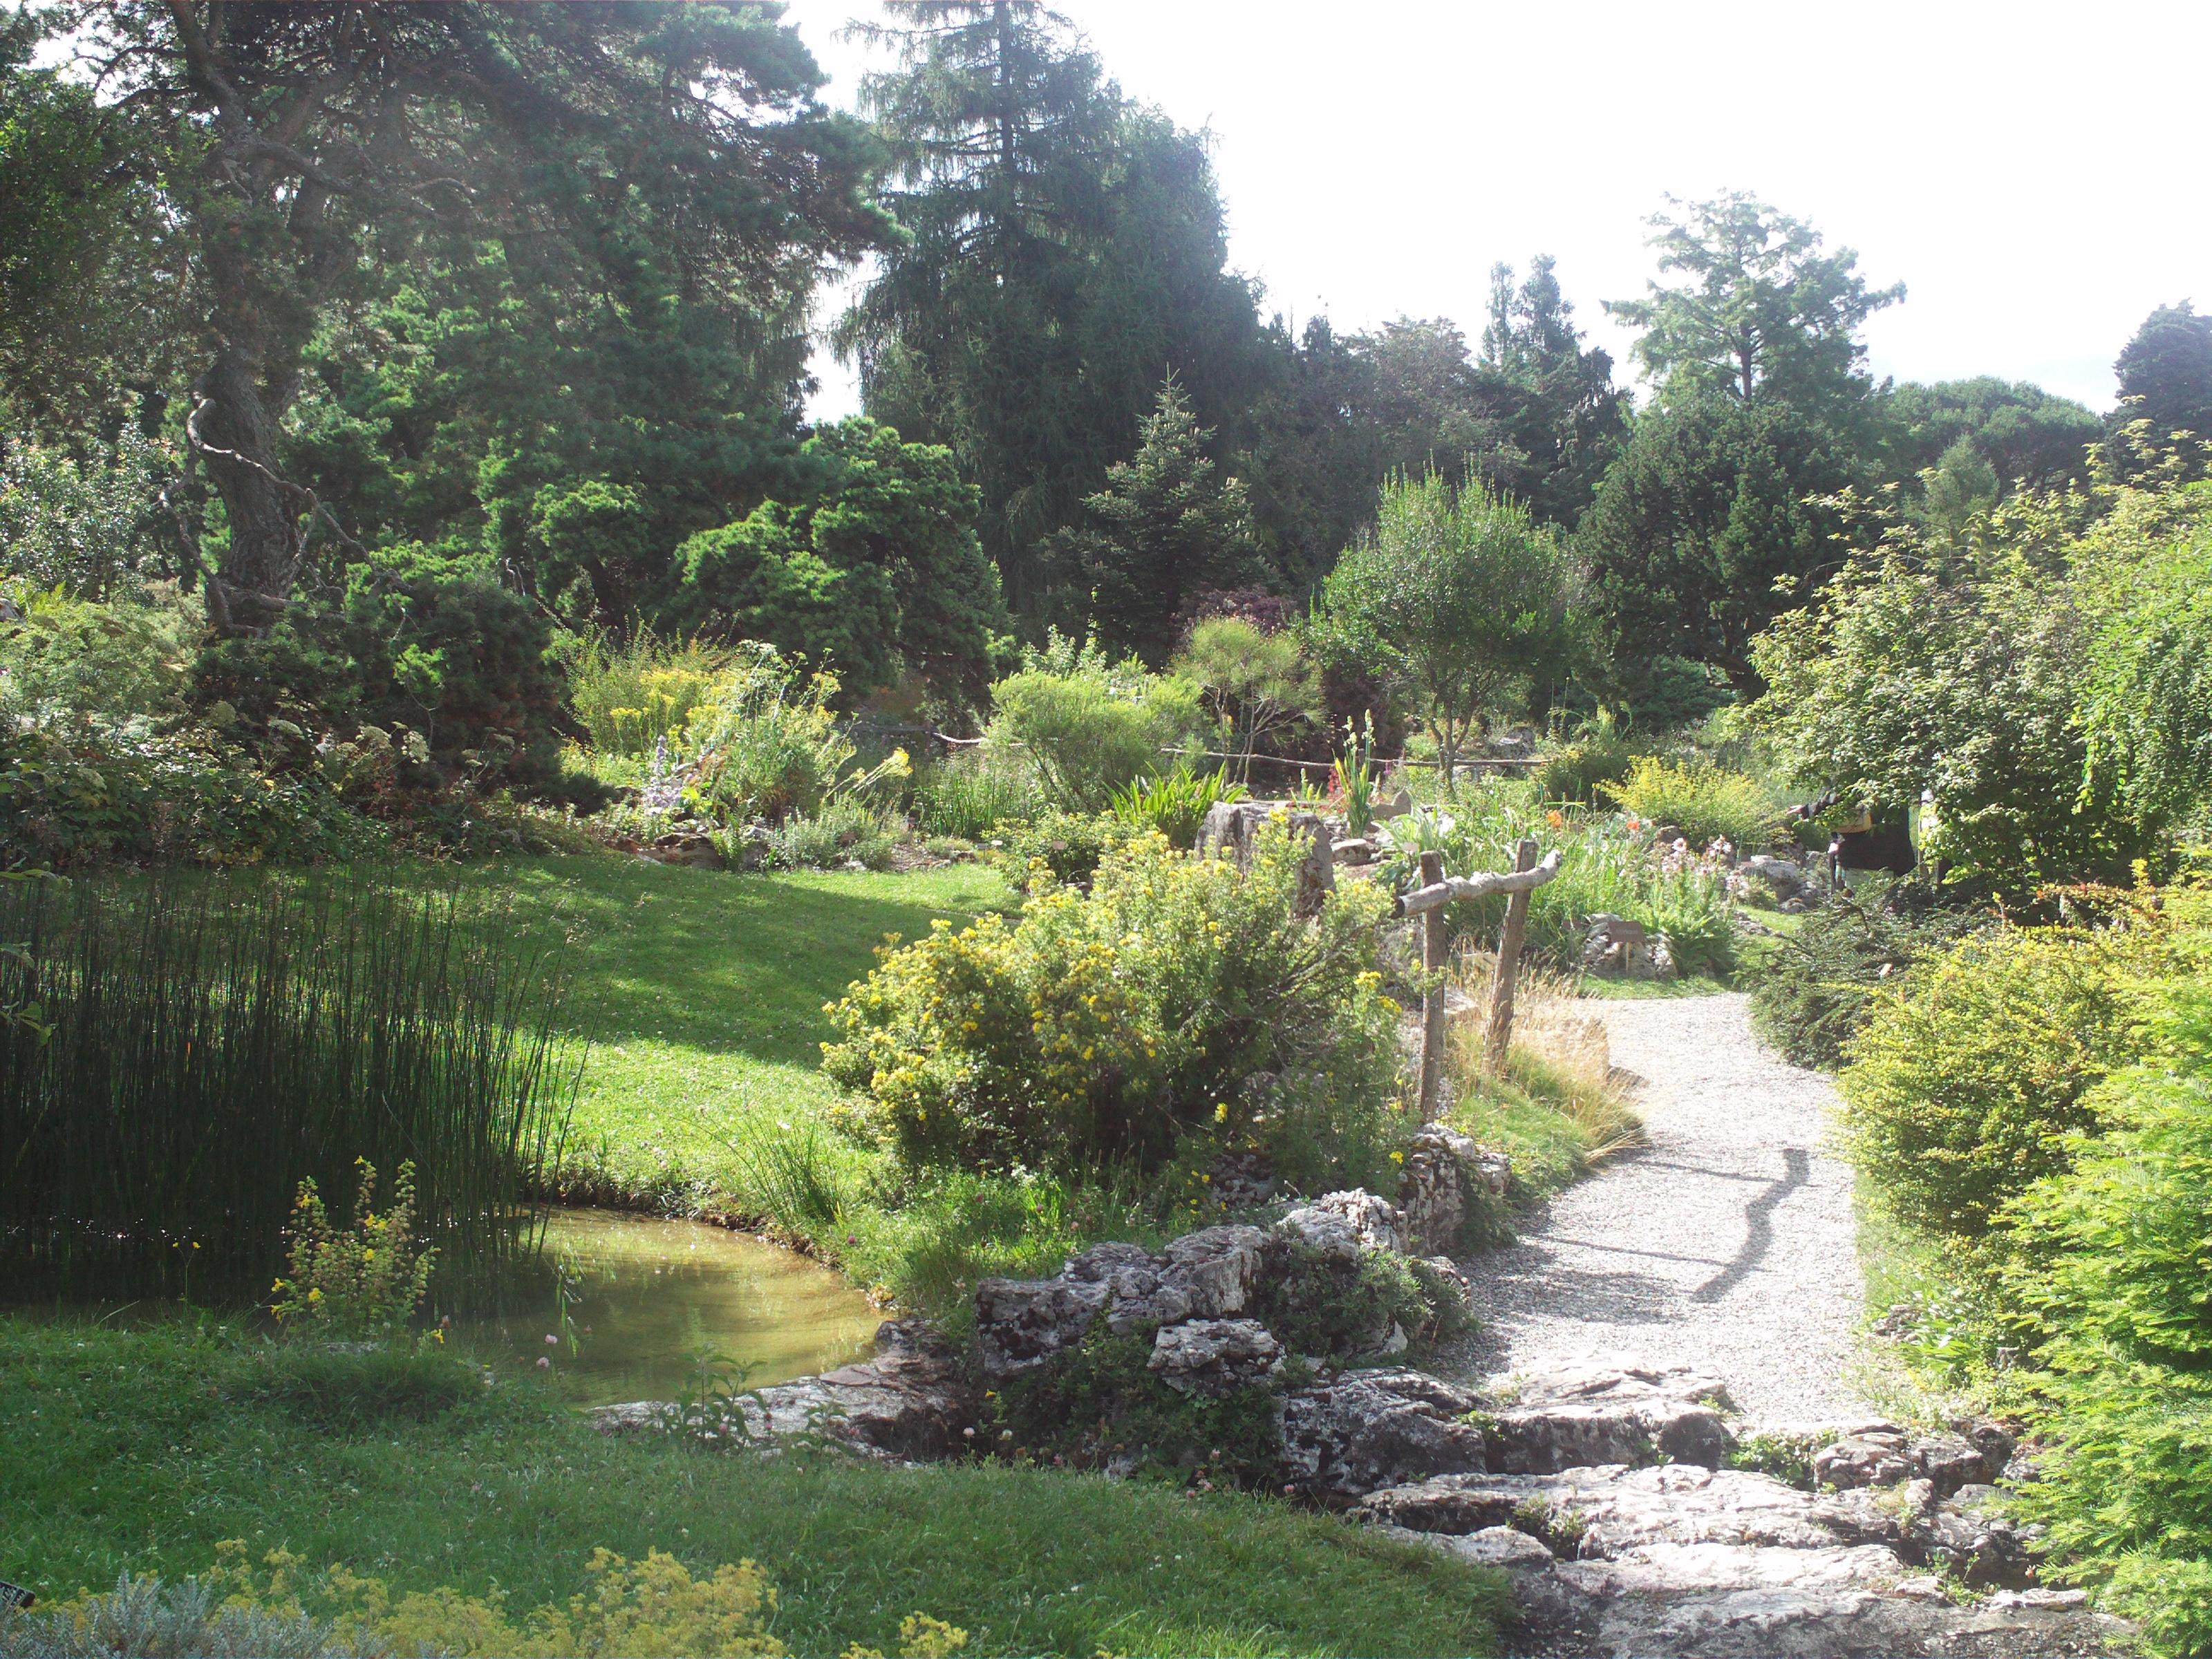 filegeneve jardin botaniquejpg - Jardin Botanique Geneve